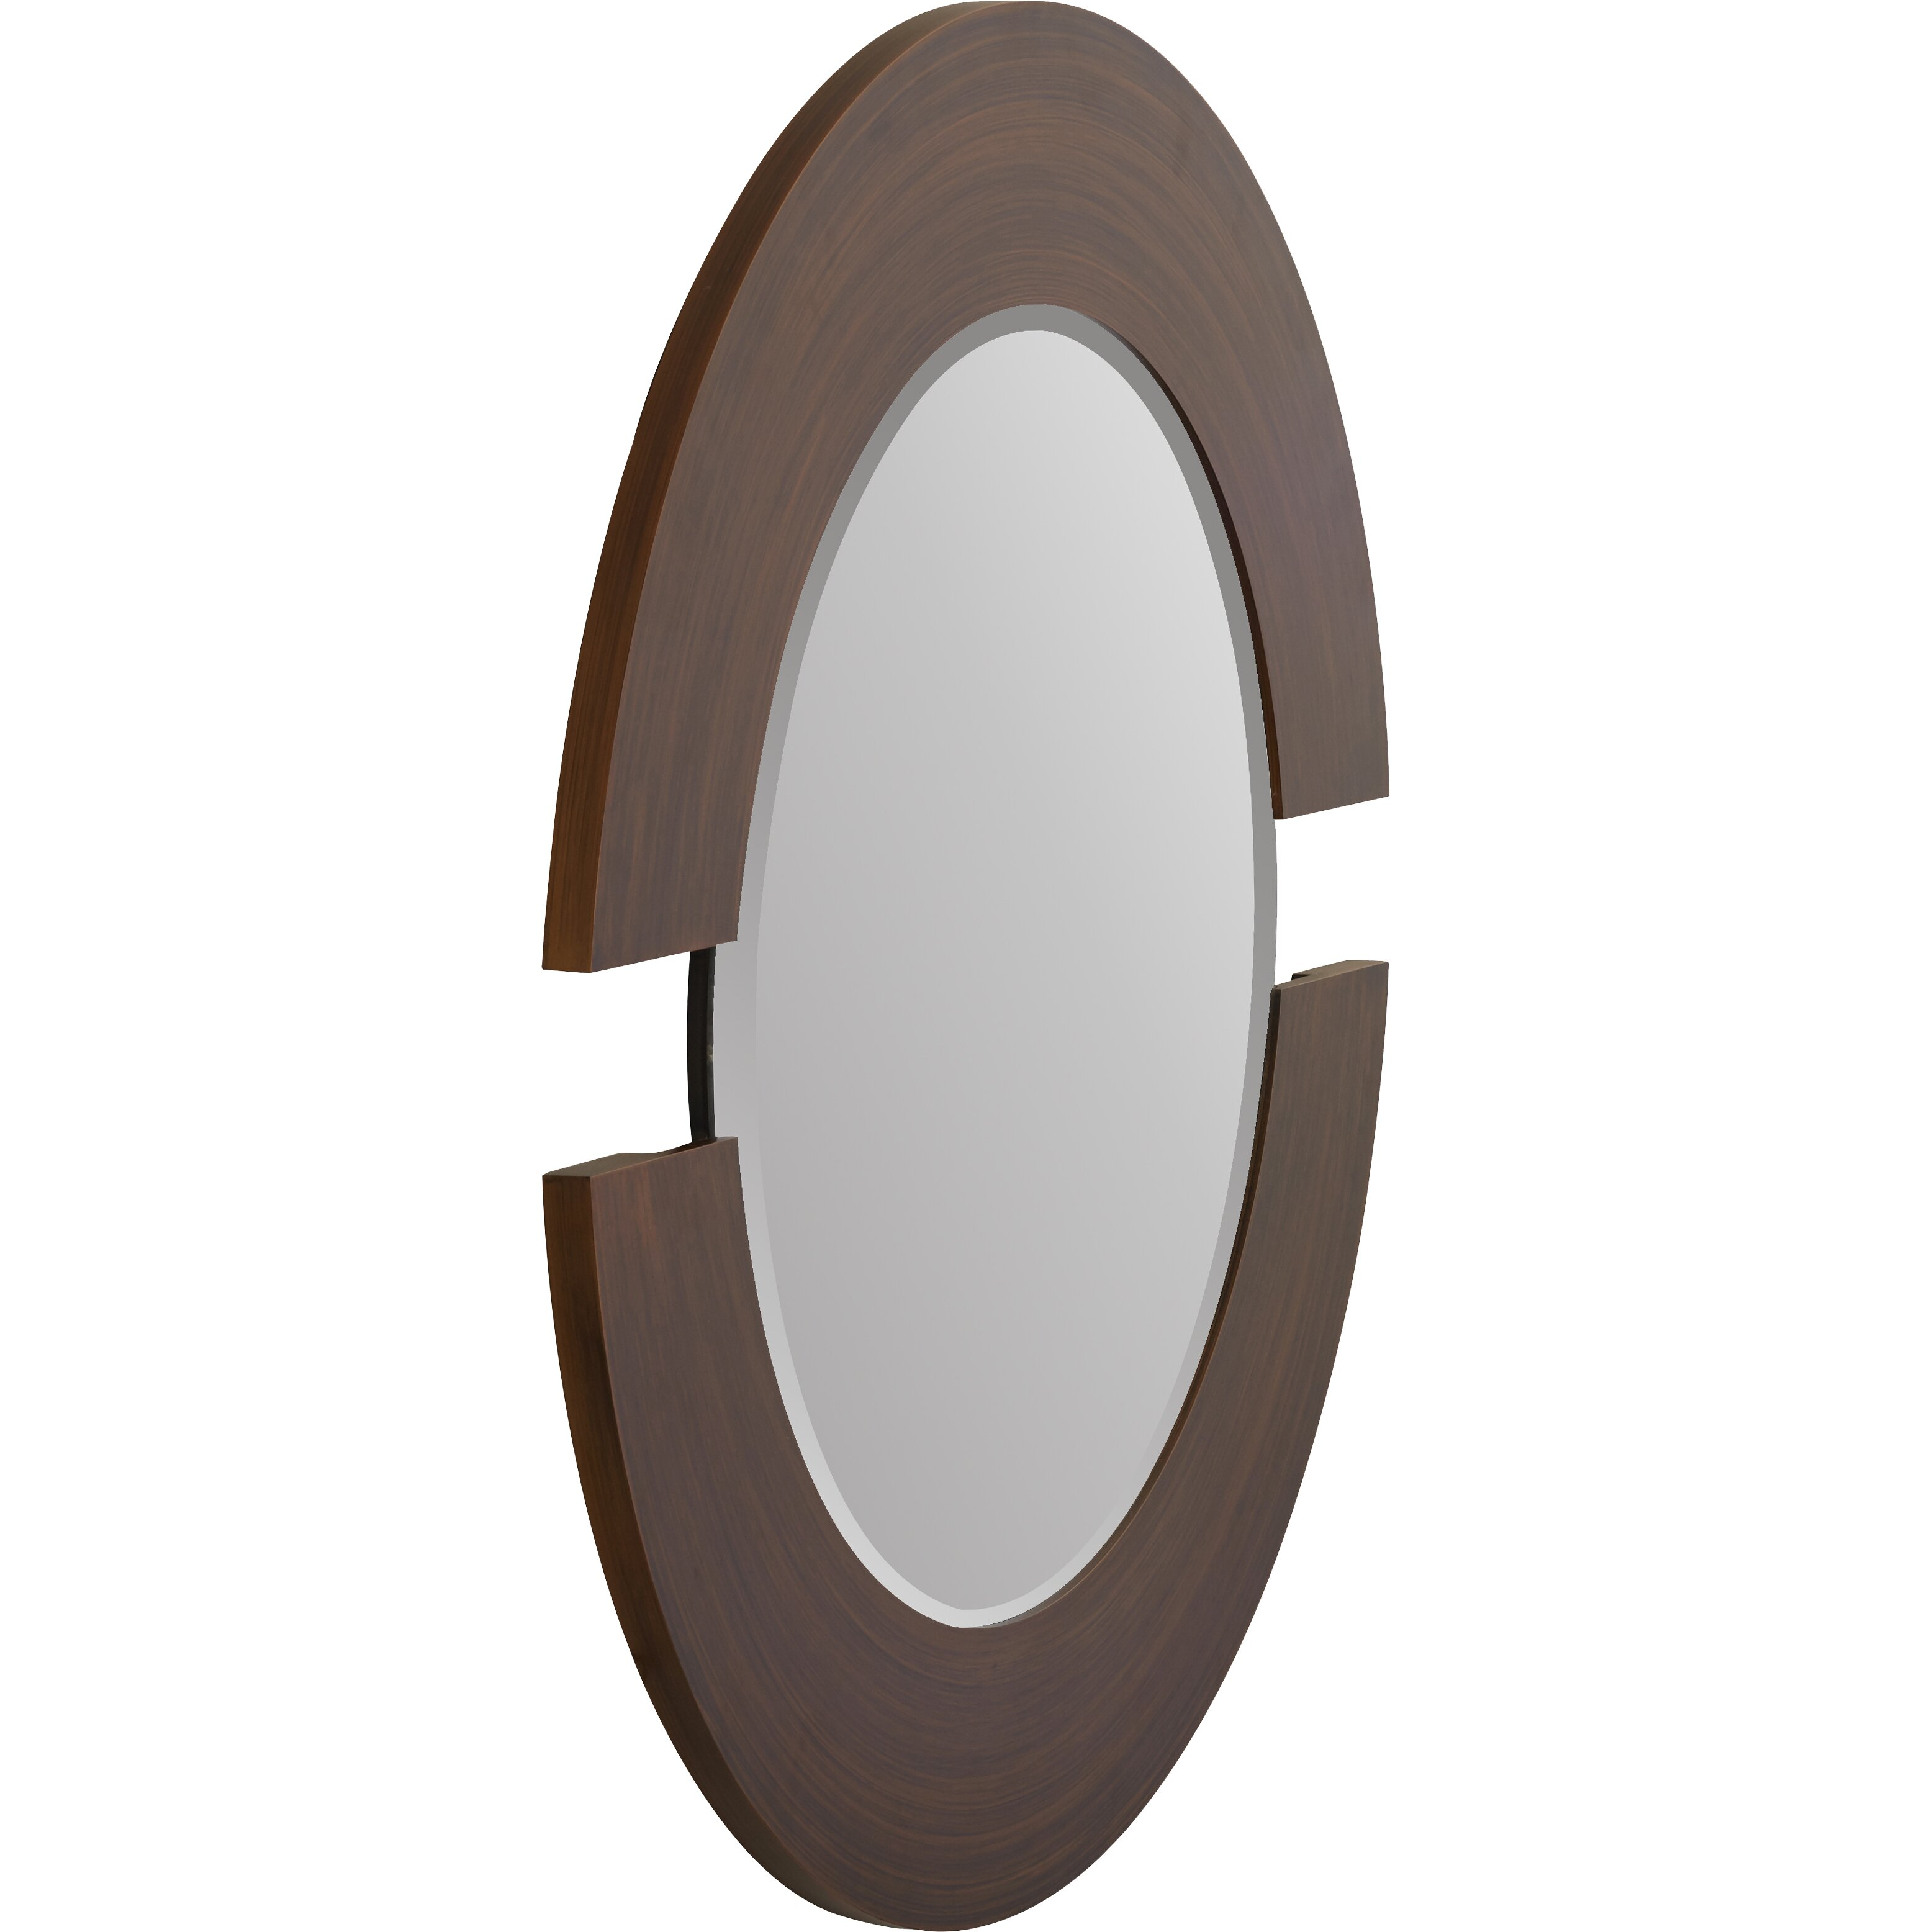 Wade logan matthew round accent mirror reviews wayfair for Accent mirrors